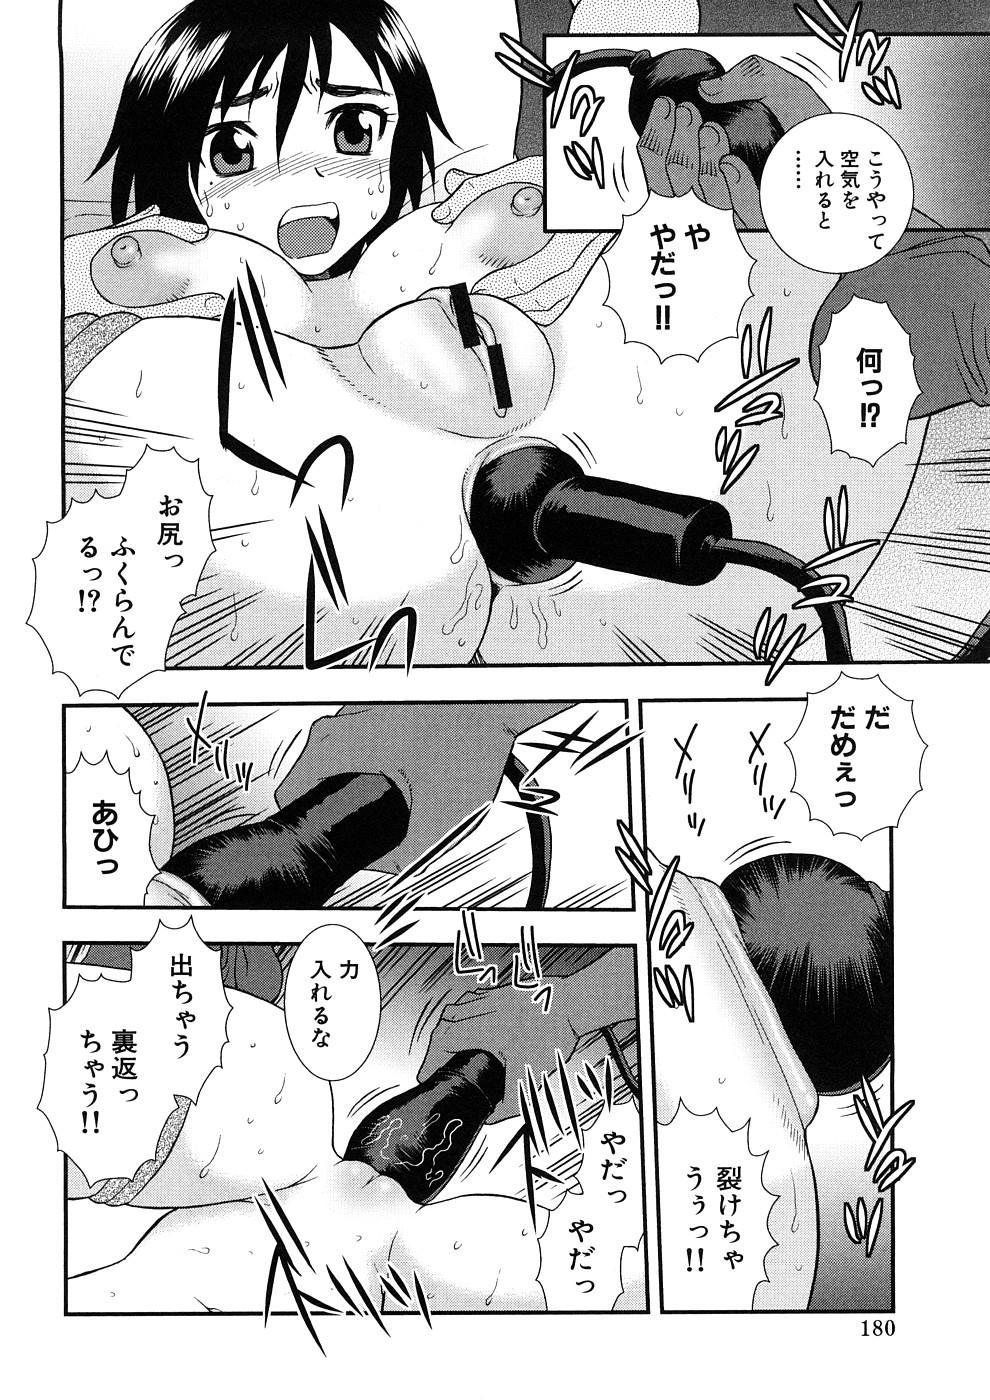 Geki Yaba Anthology Vol. 1 - Naka ni Dashite yo 180